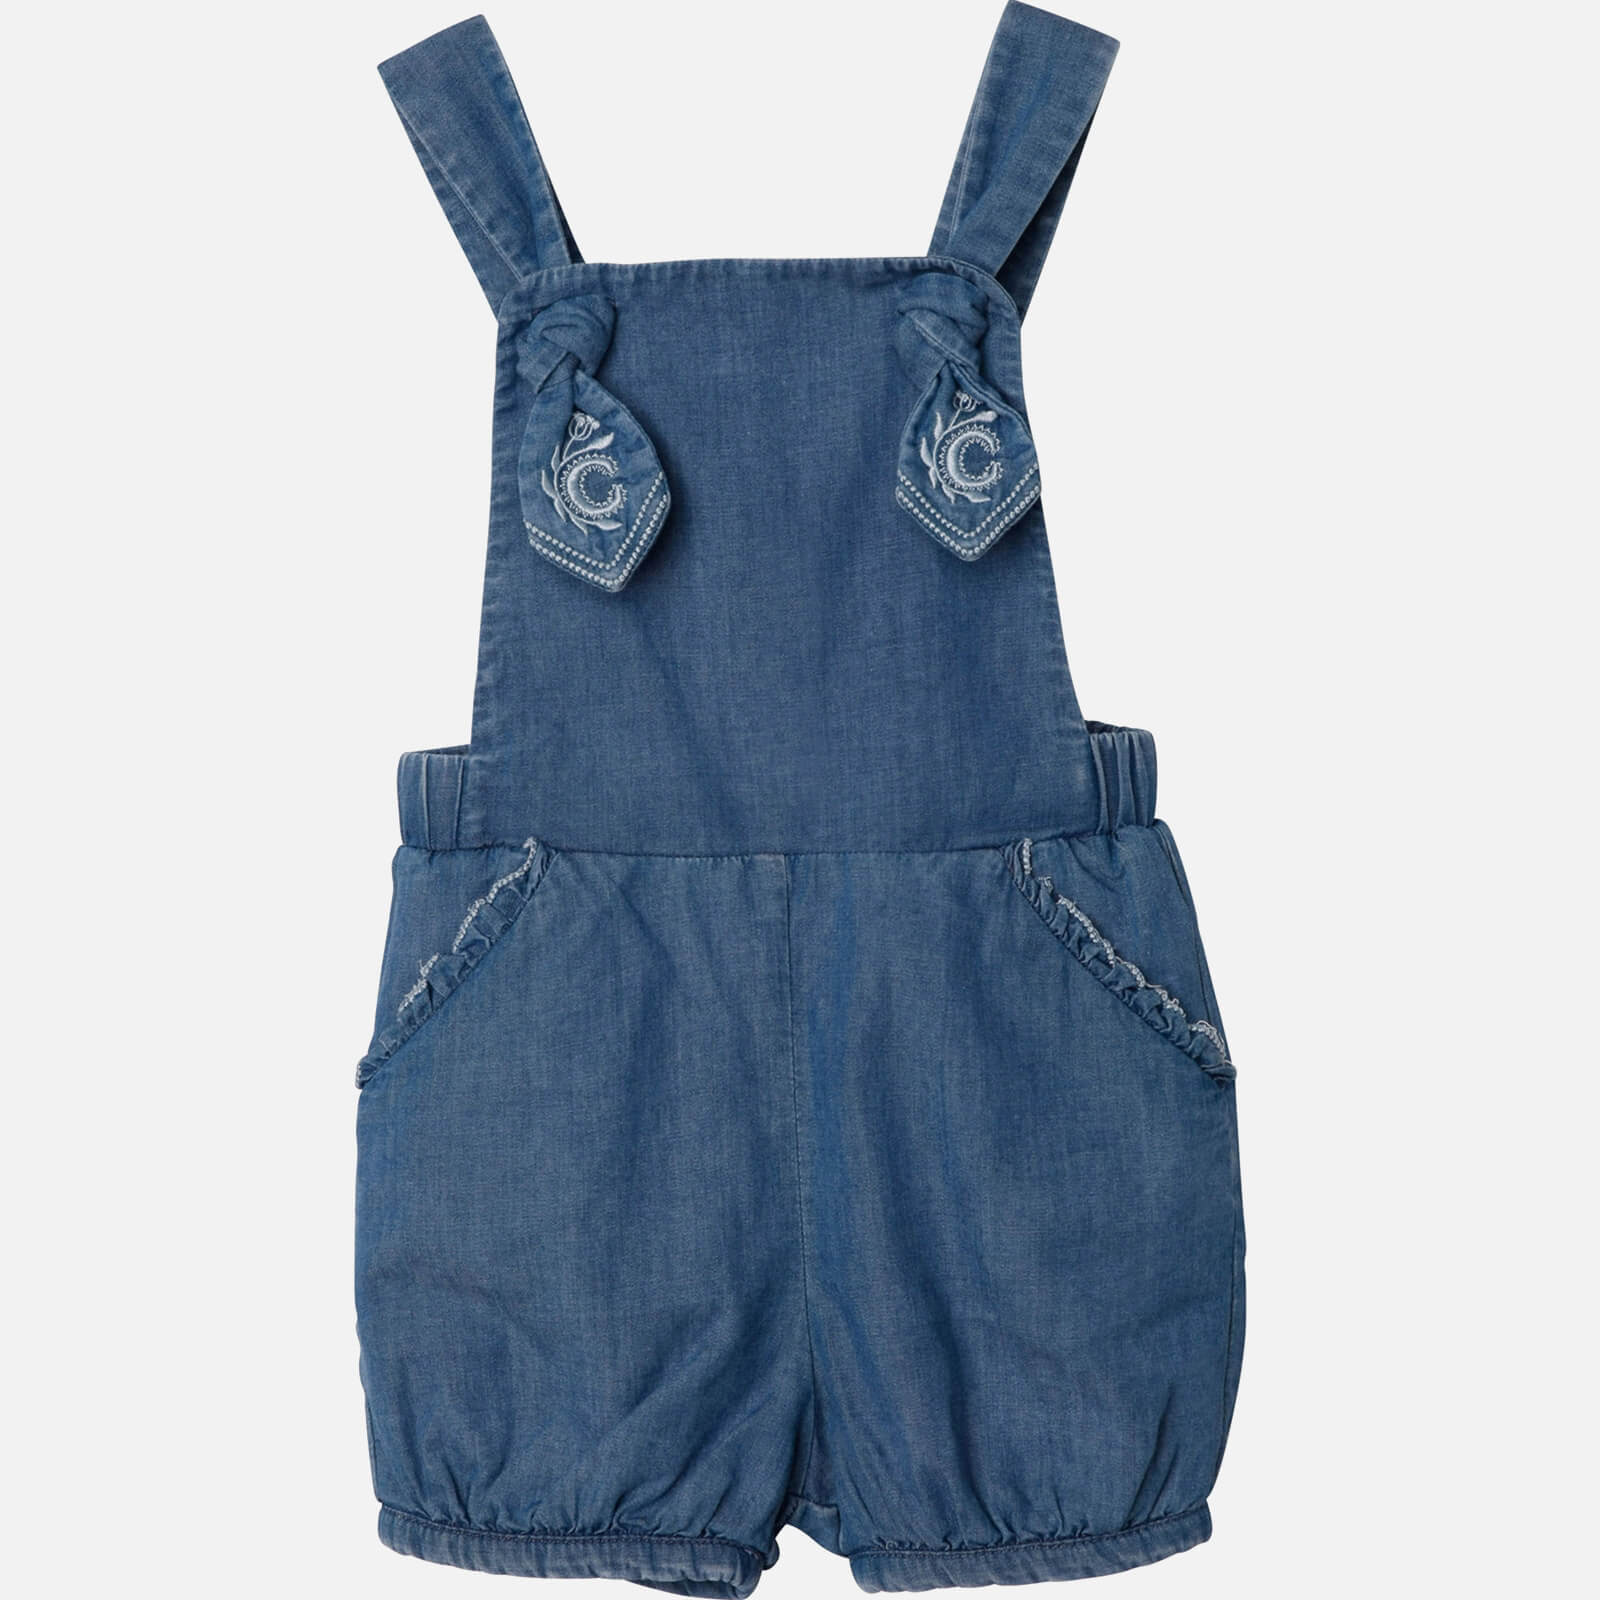 Chloe Girls' Toddlers All In One Romper - Denim Blue - 2 Years